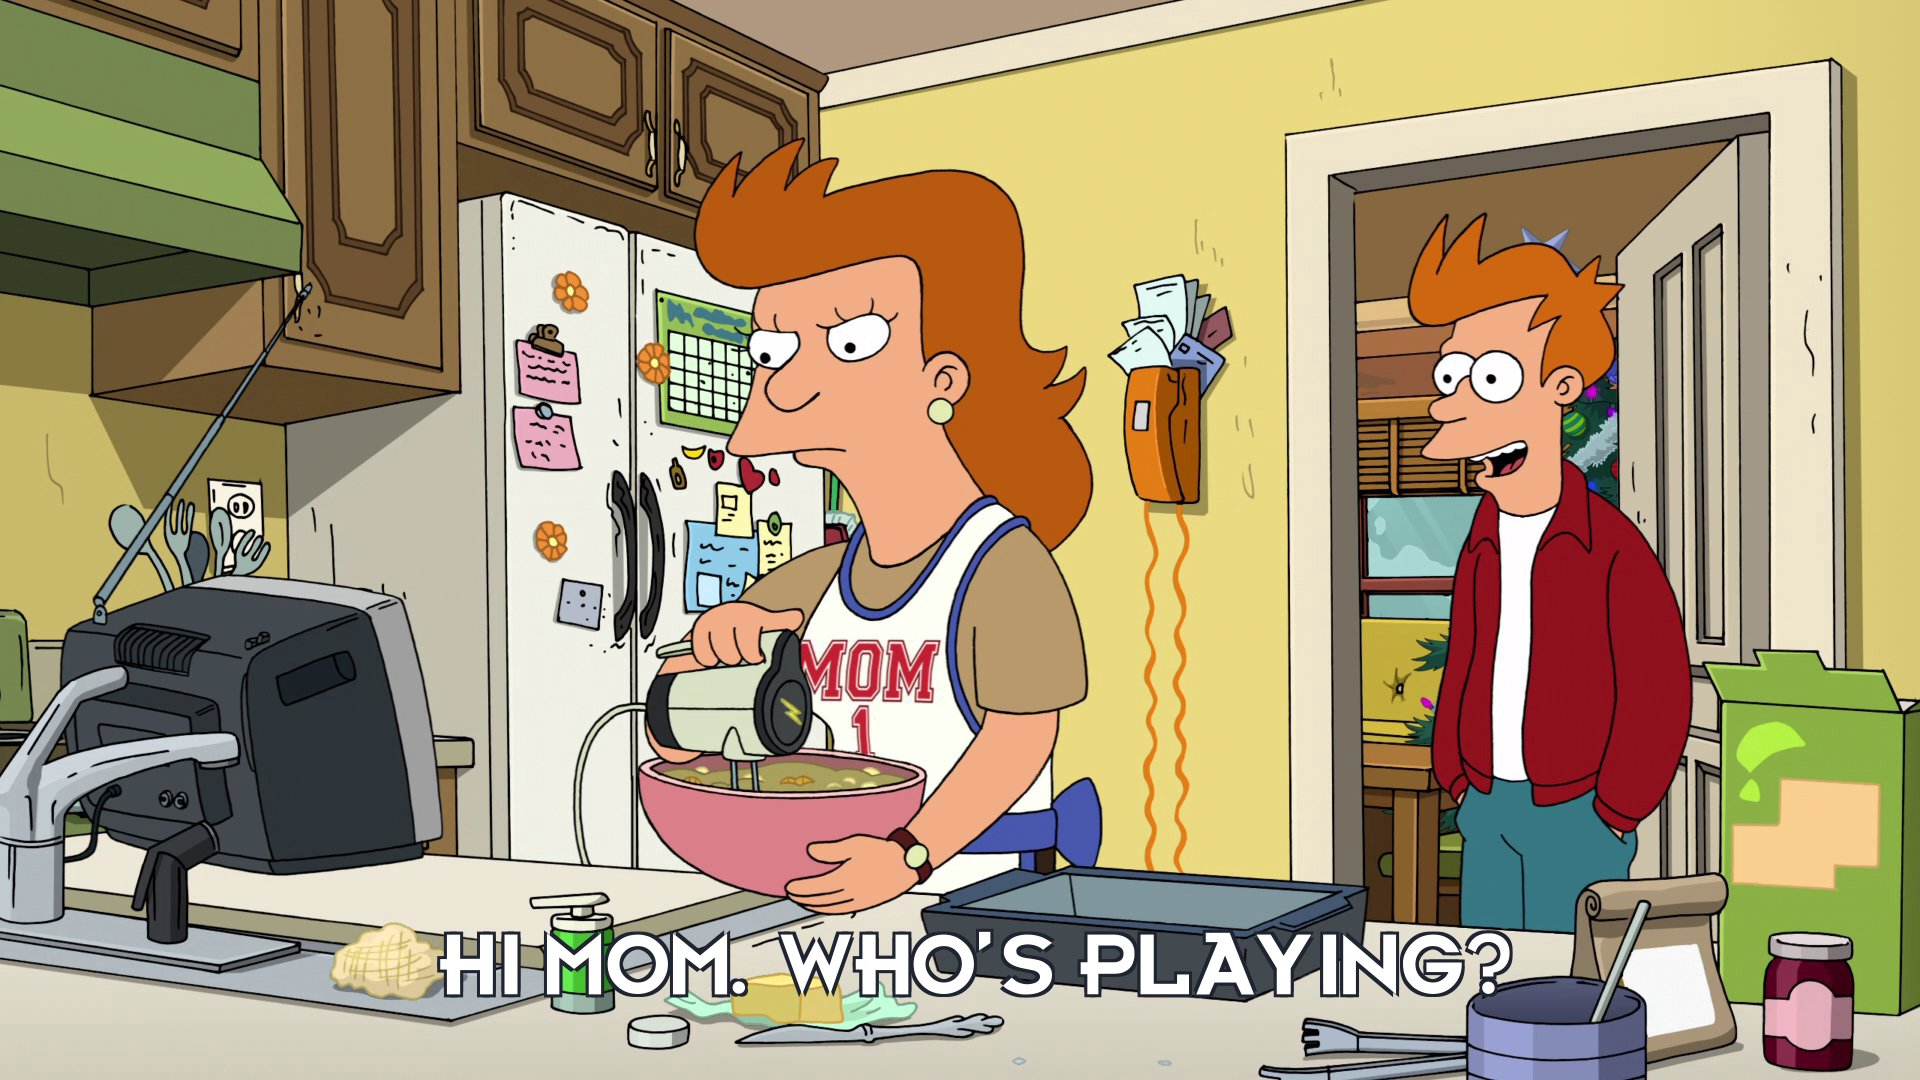 Philip J Fry: Hi Mom. Who's playing?